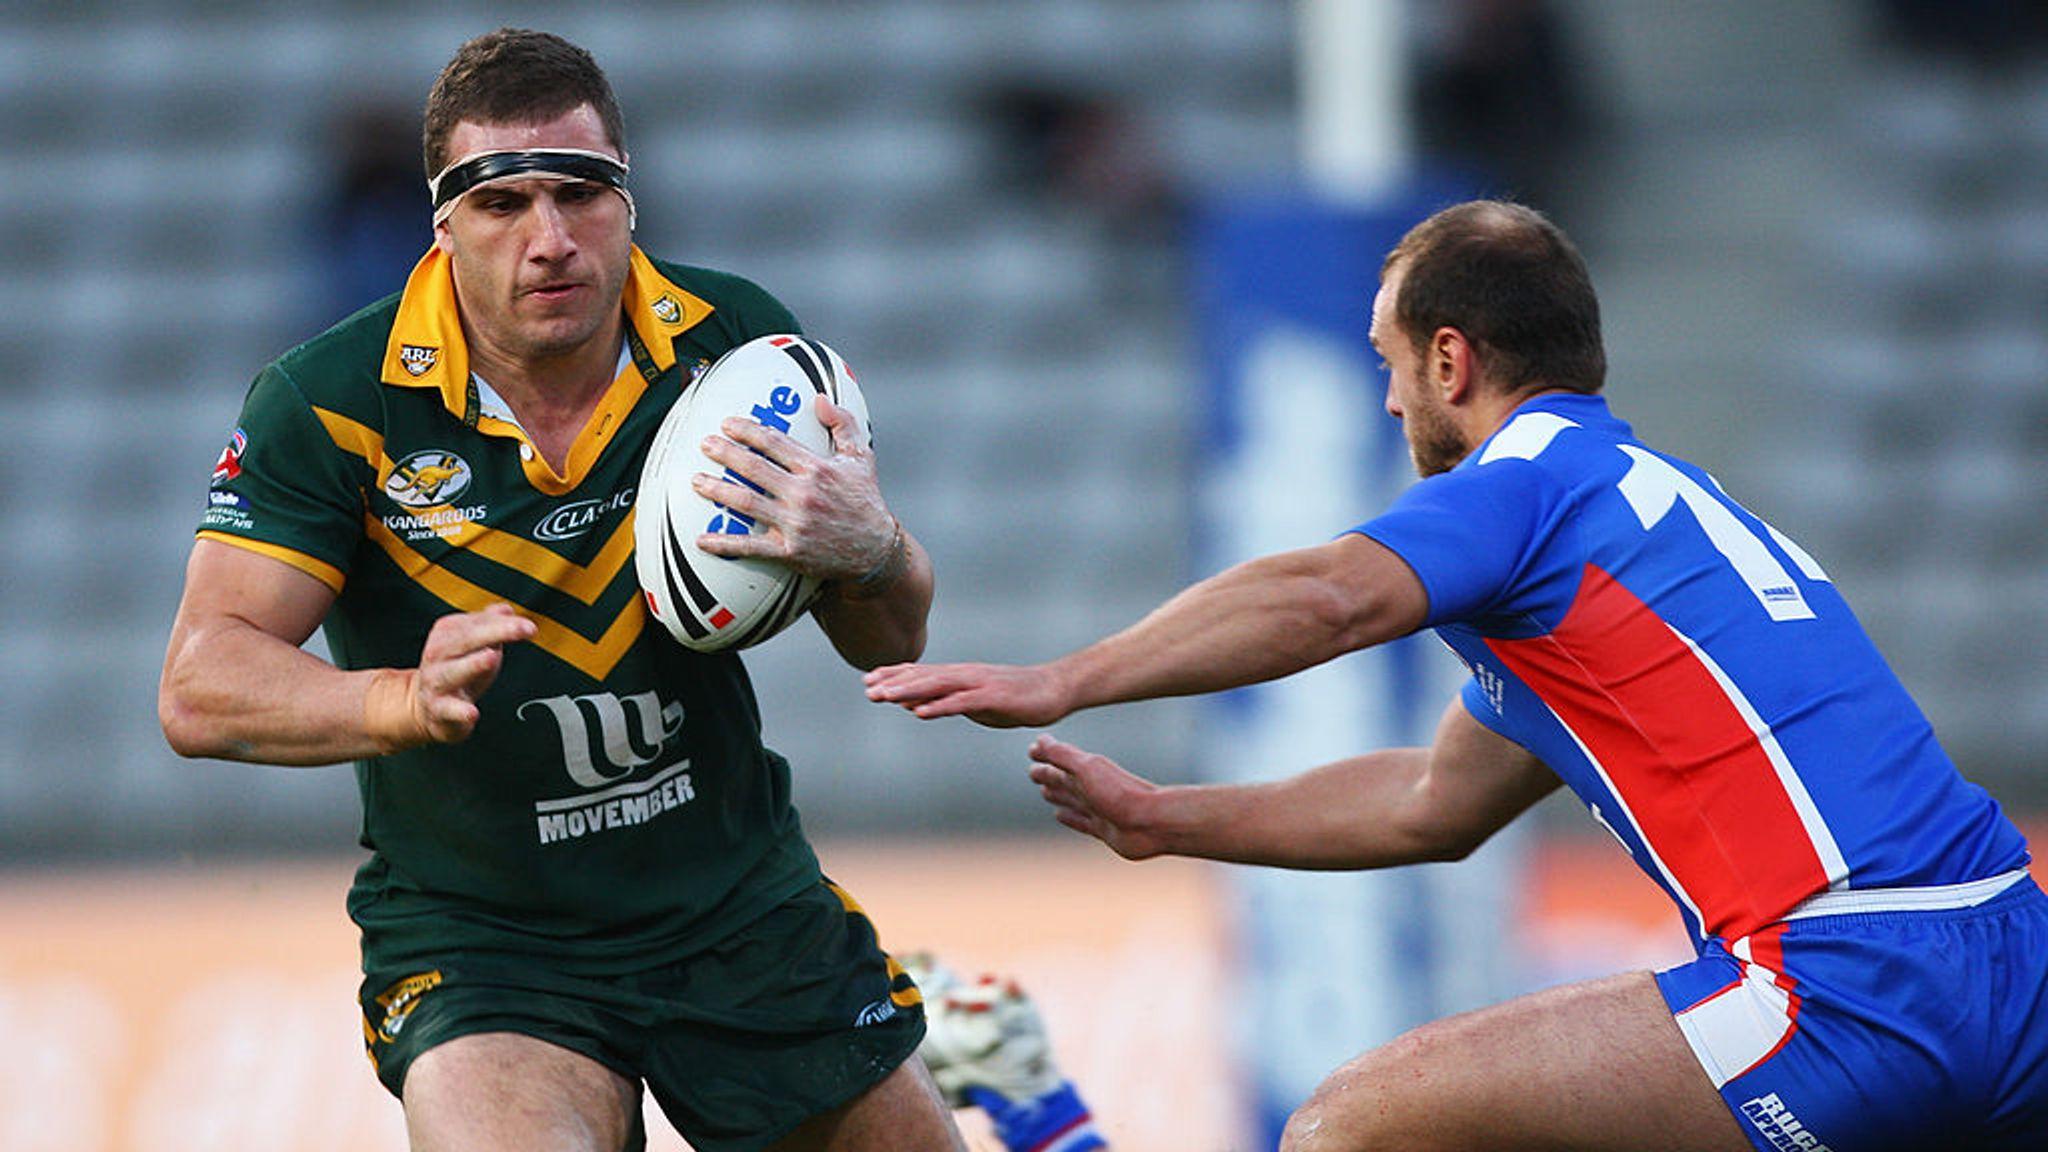 Andy Mannah lebanon to be ledformer australia hooker robbie farah at